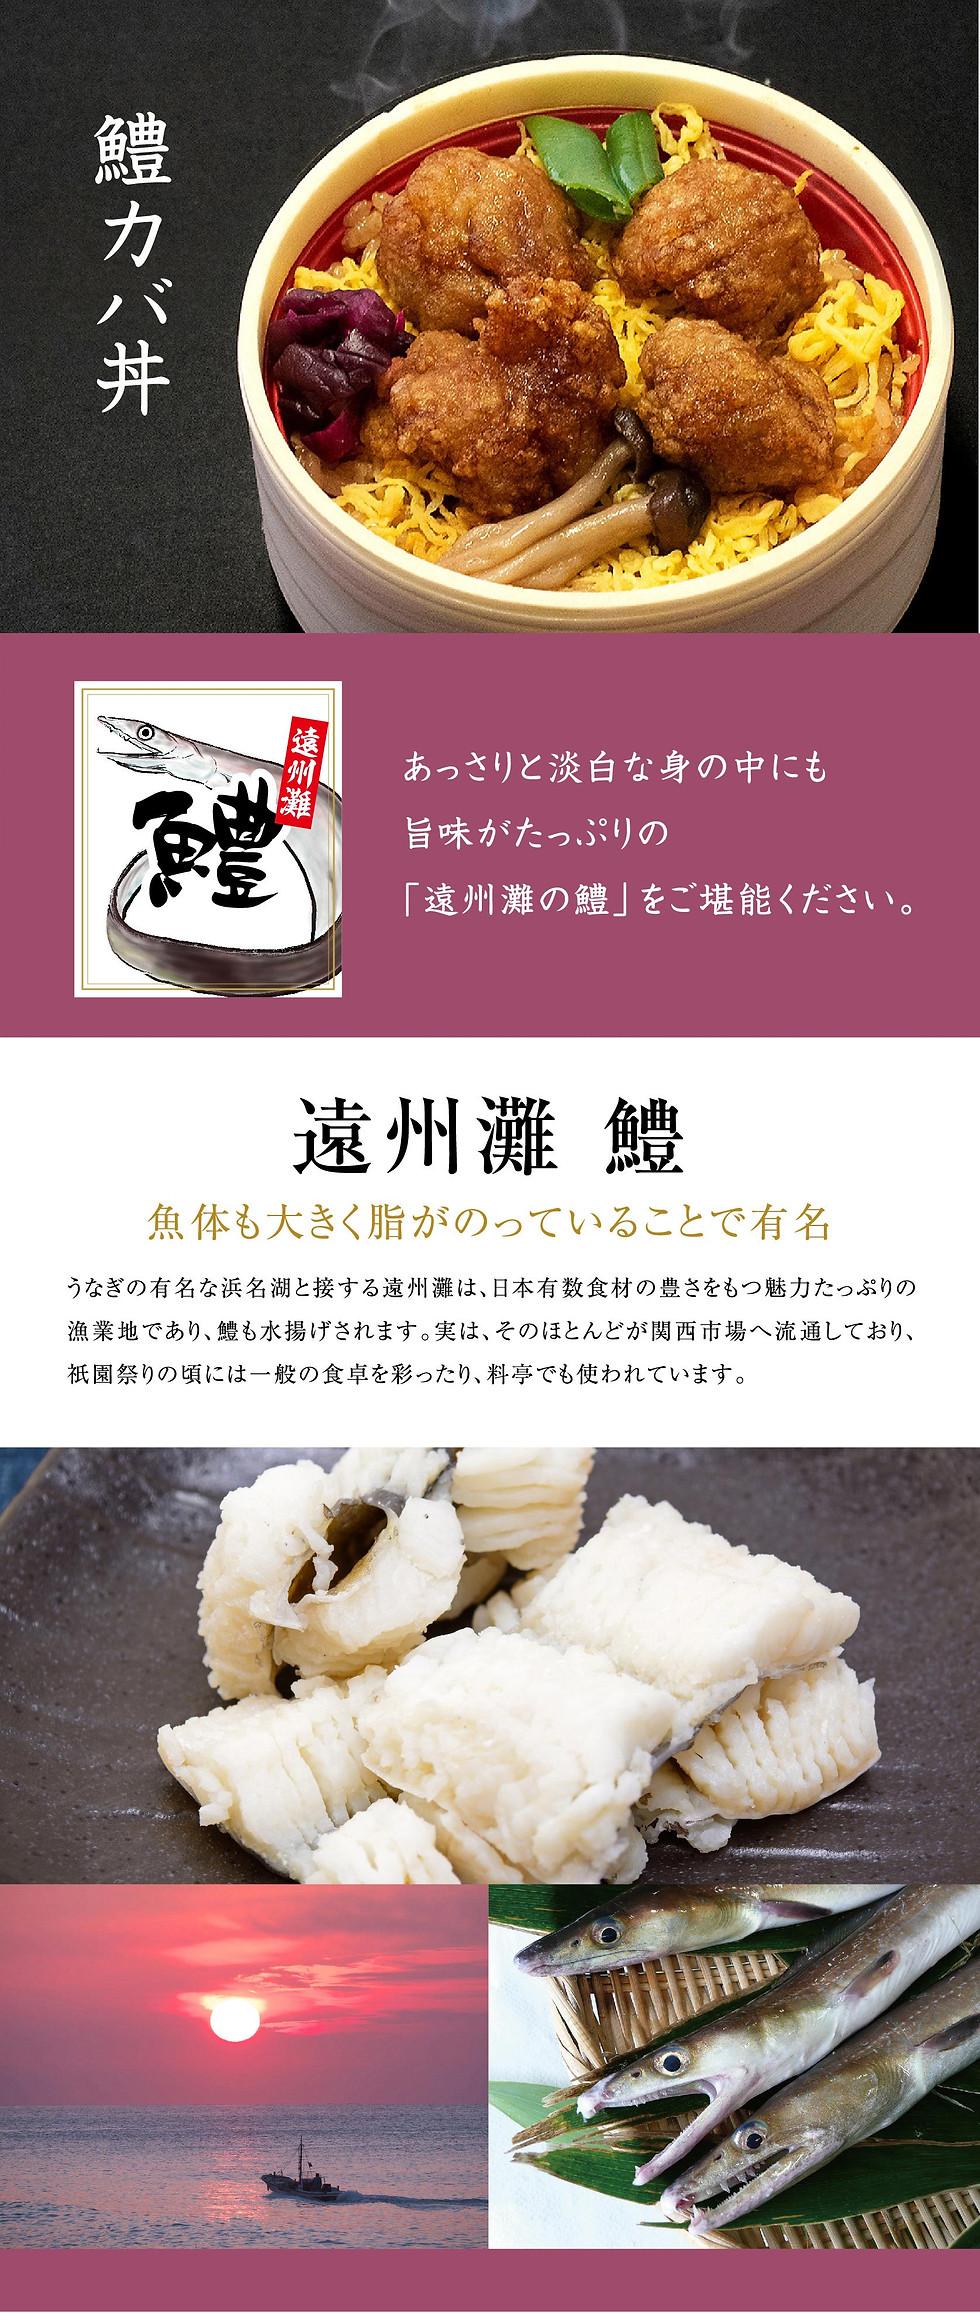 sizuokamatsuri-lp03.jpg